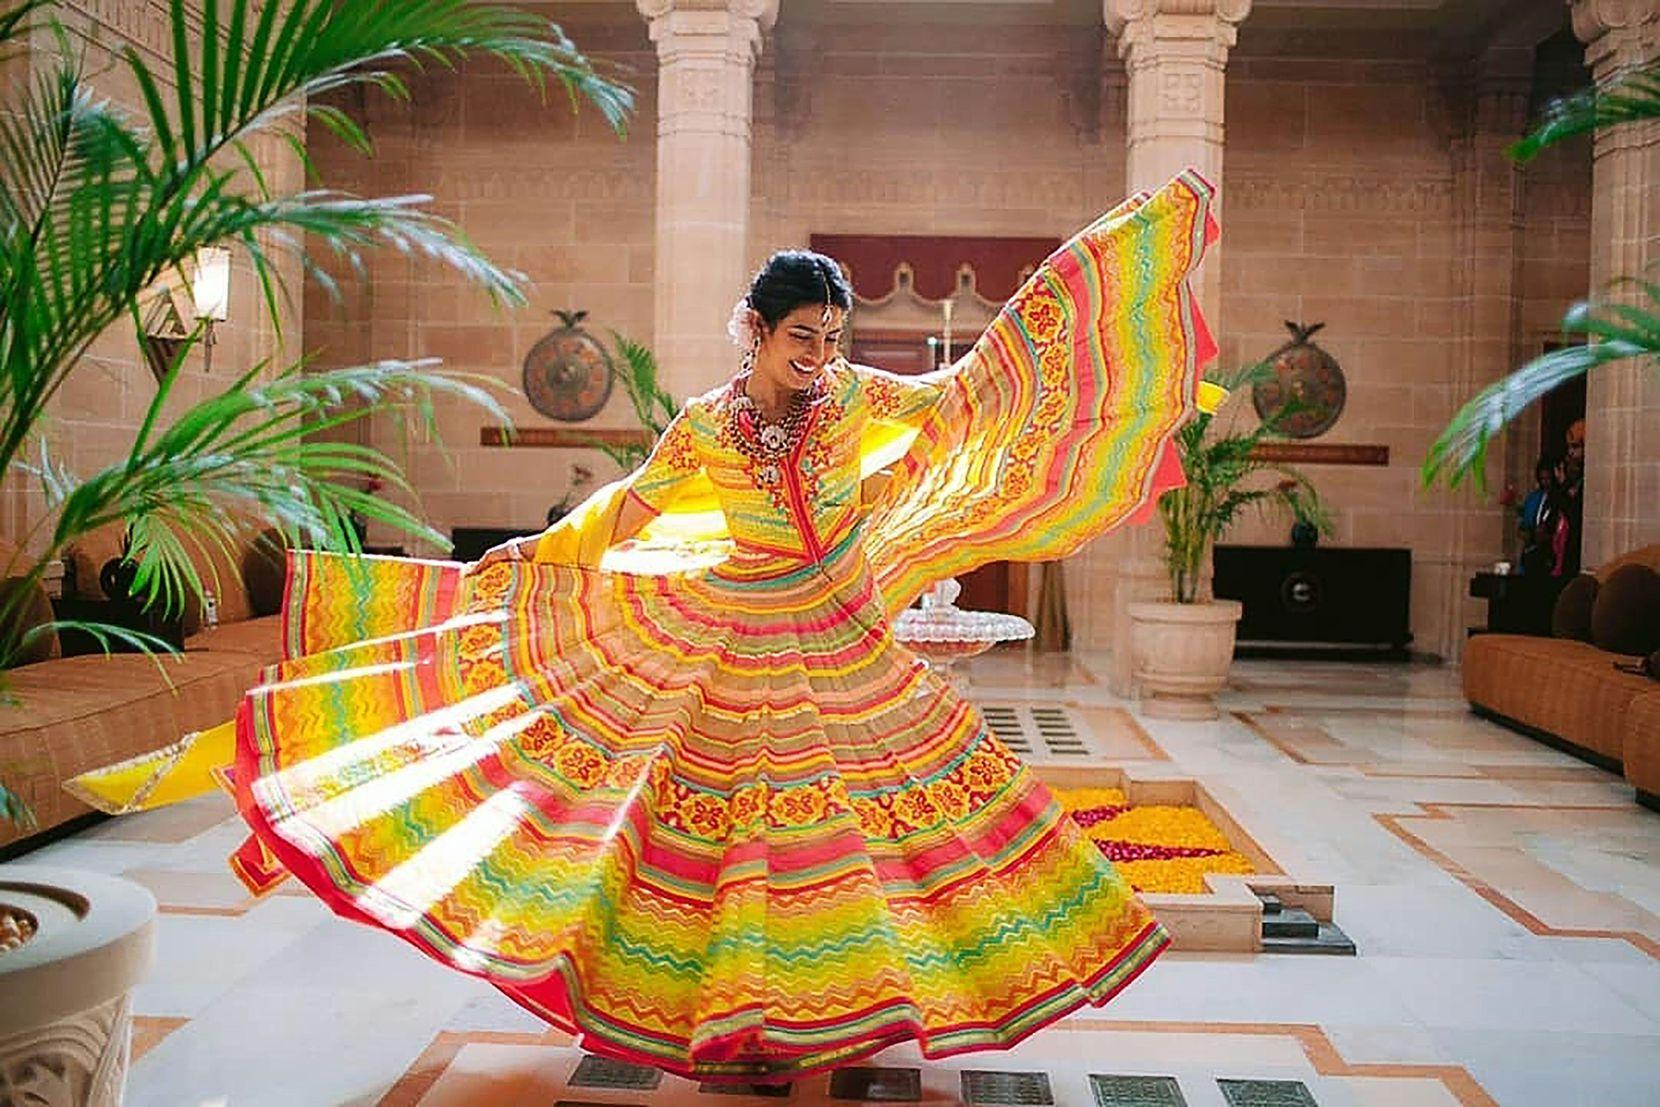 This handout photo released by Raindrop Media shows Bollywood actress Priyanka Chopra dancing during her wedding celebration with American singer Nick Jonas at Umaid Bhawan palace in Jodhpur.